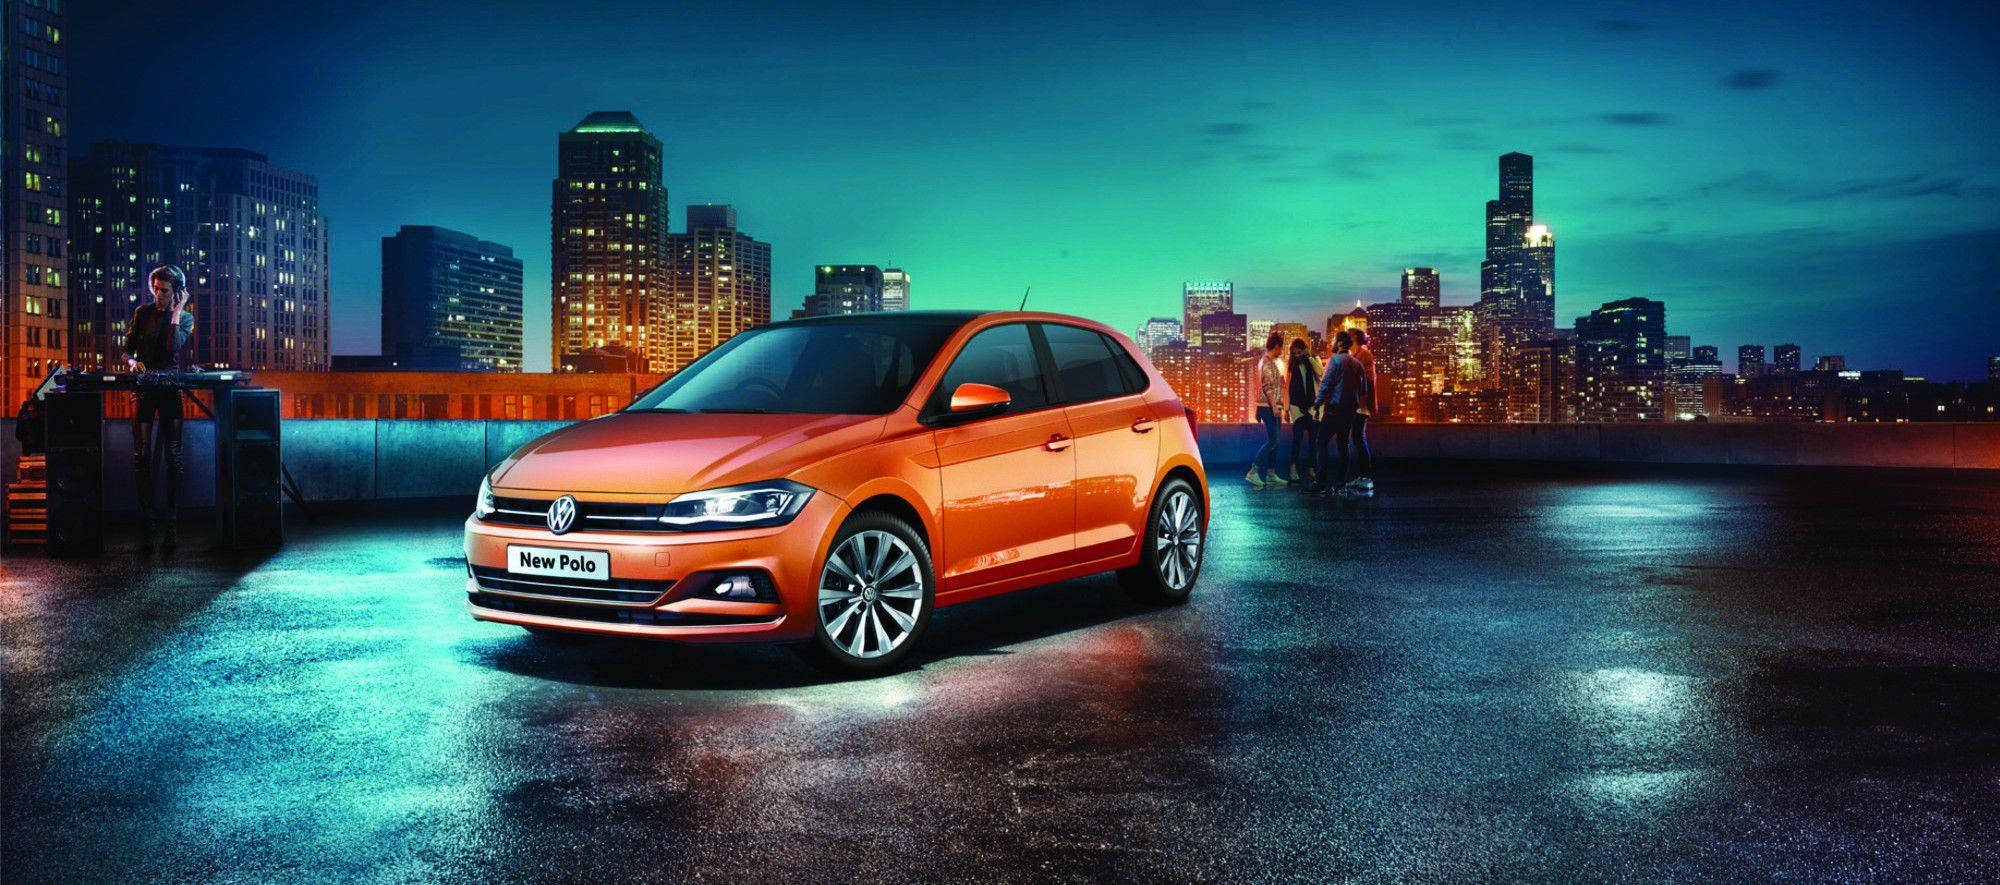 volkswagen in new bangalore dealers dealership showroom car gti